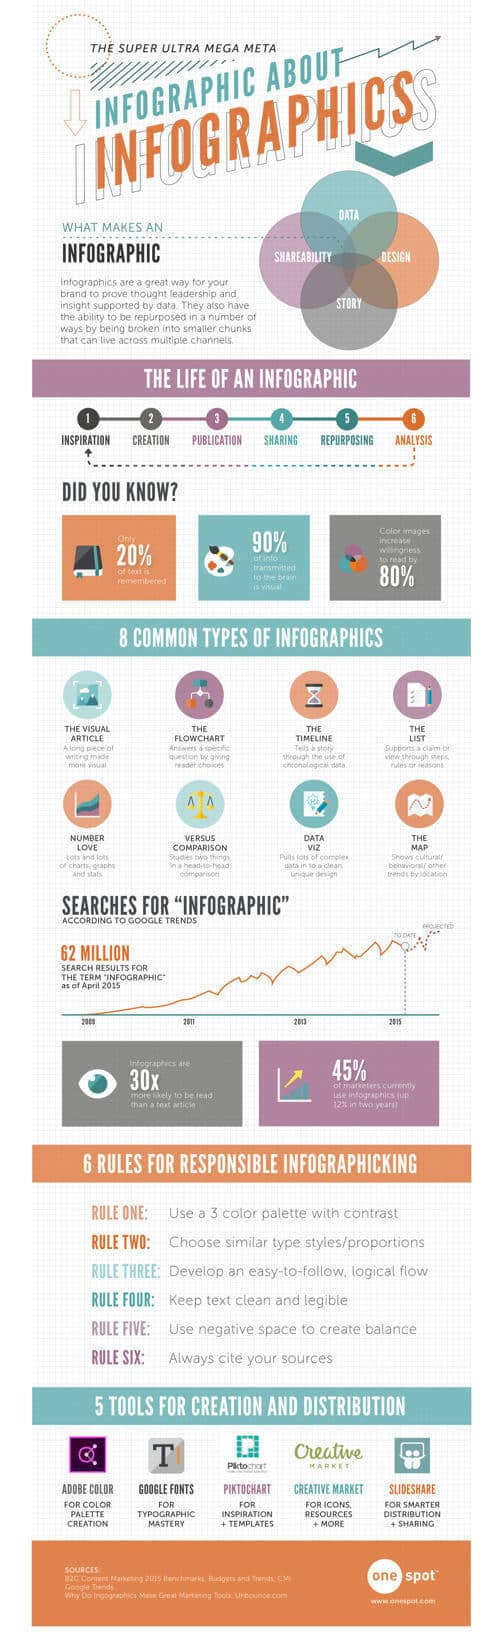 guia-crear-mejores-infografias